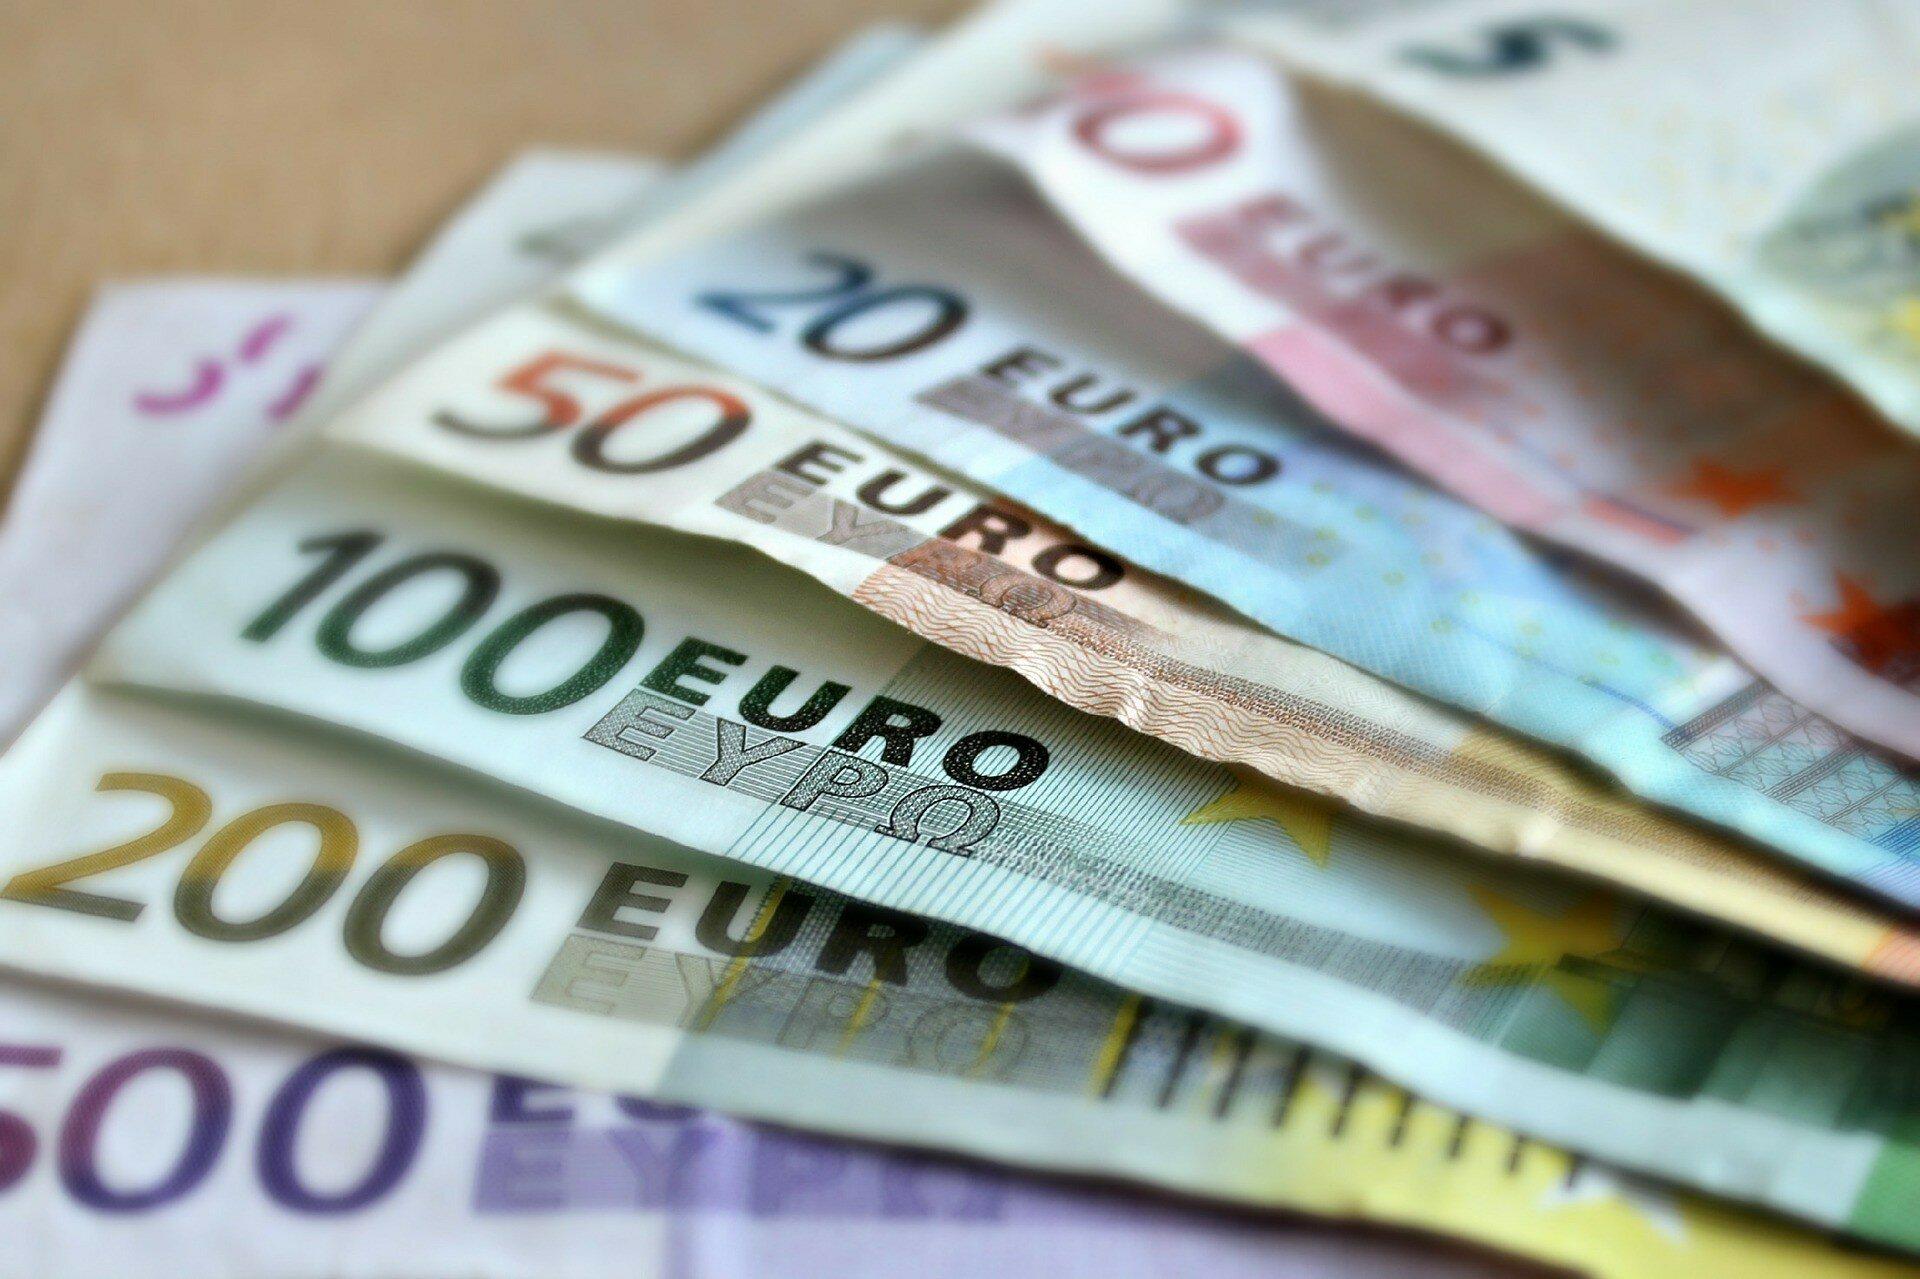 Жители Германии накопили миллиарды евро